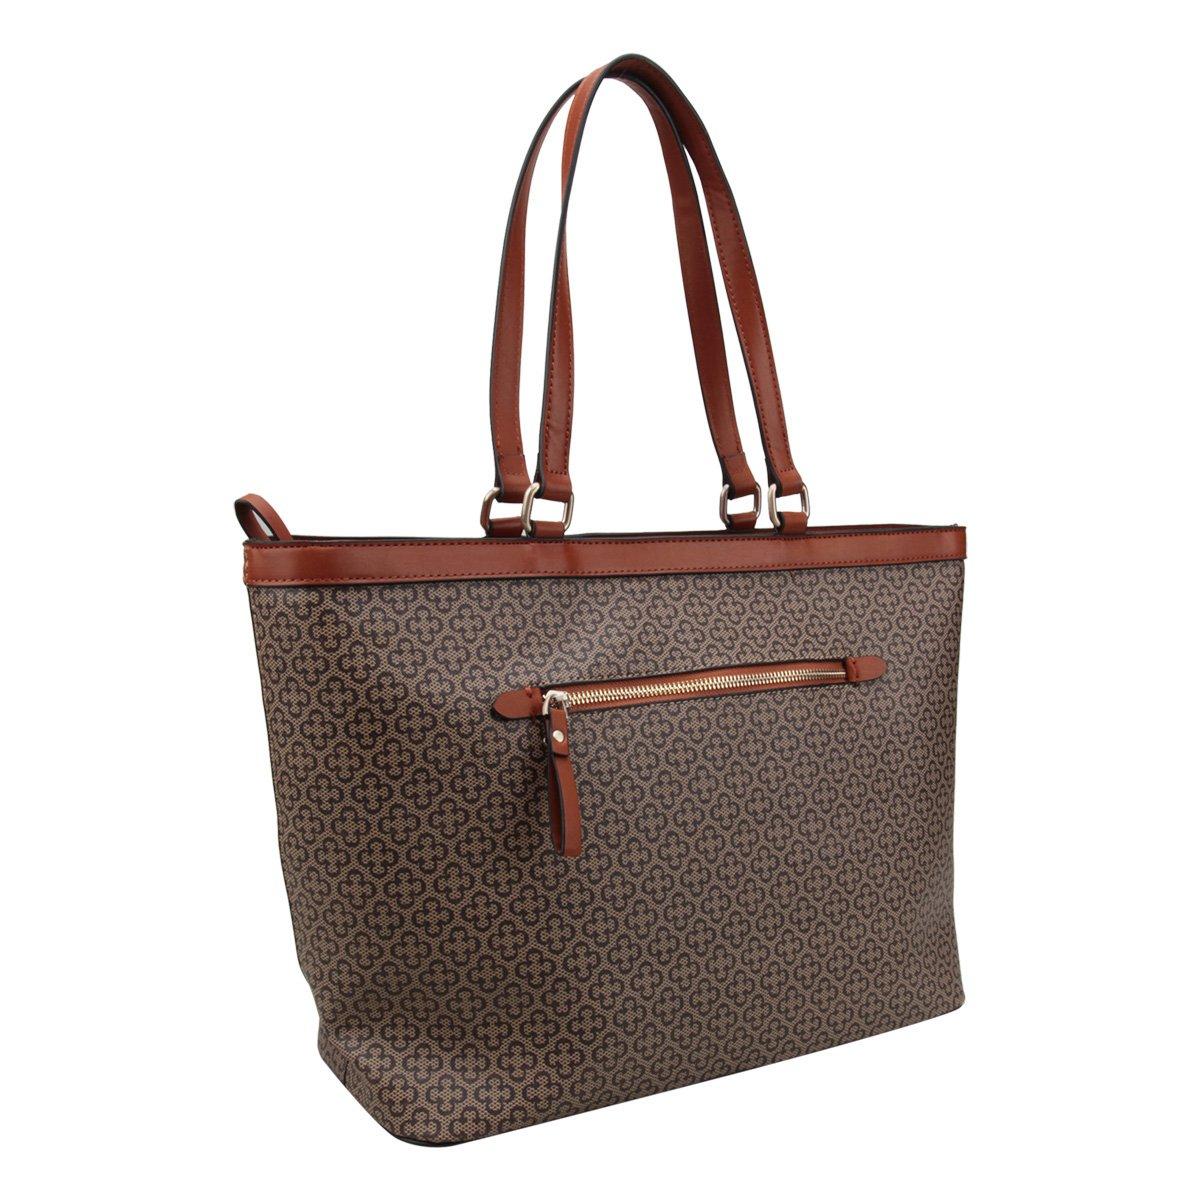 Bege Bolsa Feminina Monograma Capodarte Shopper Capodarte Bolsa Yq1nwFT